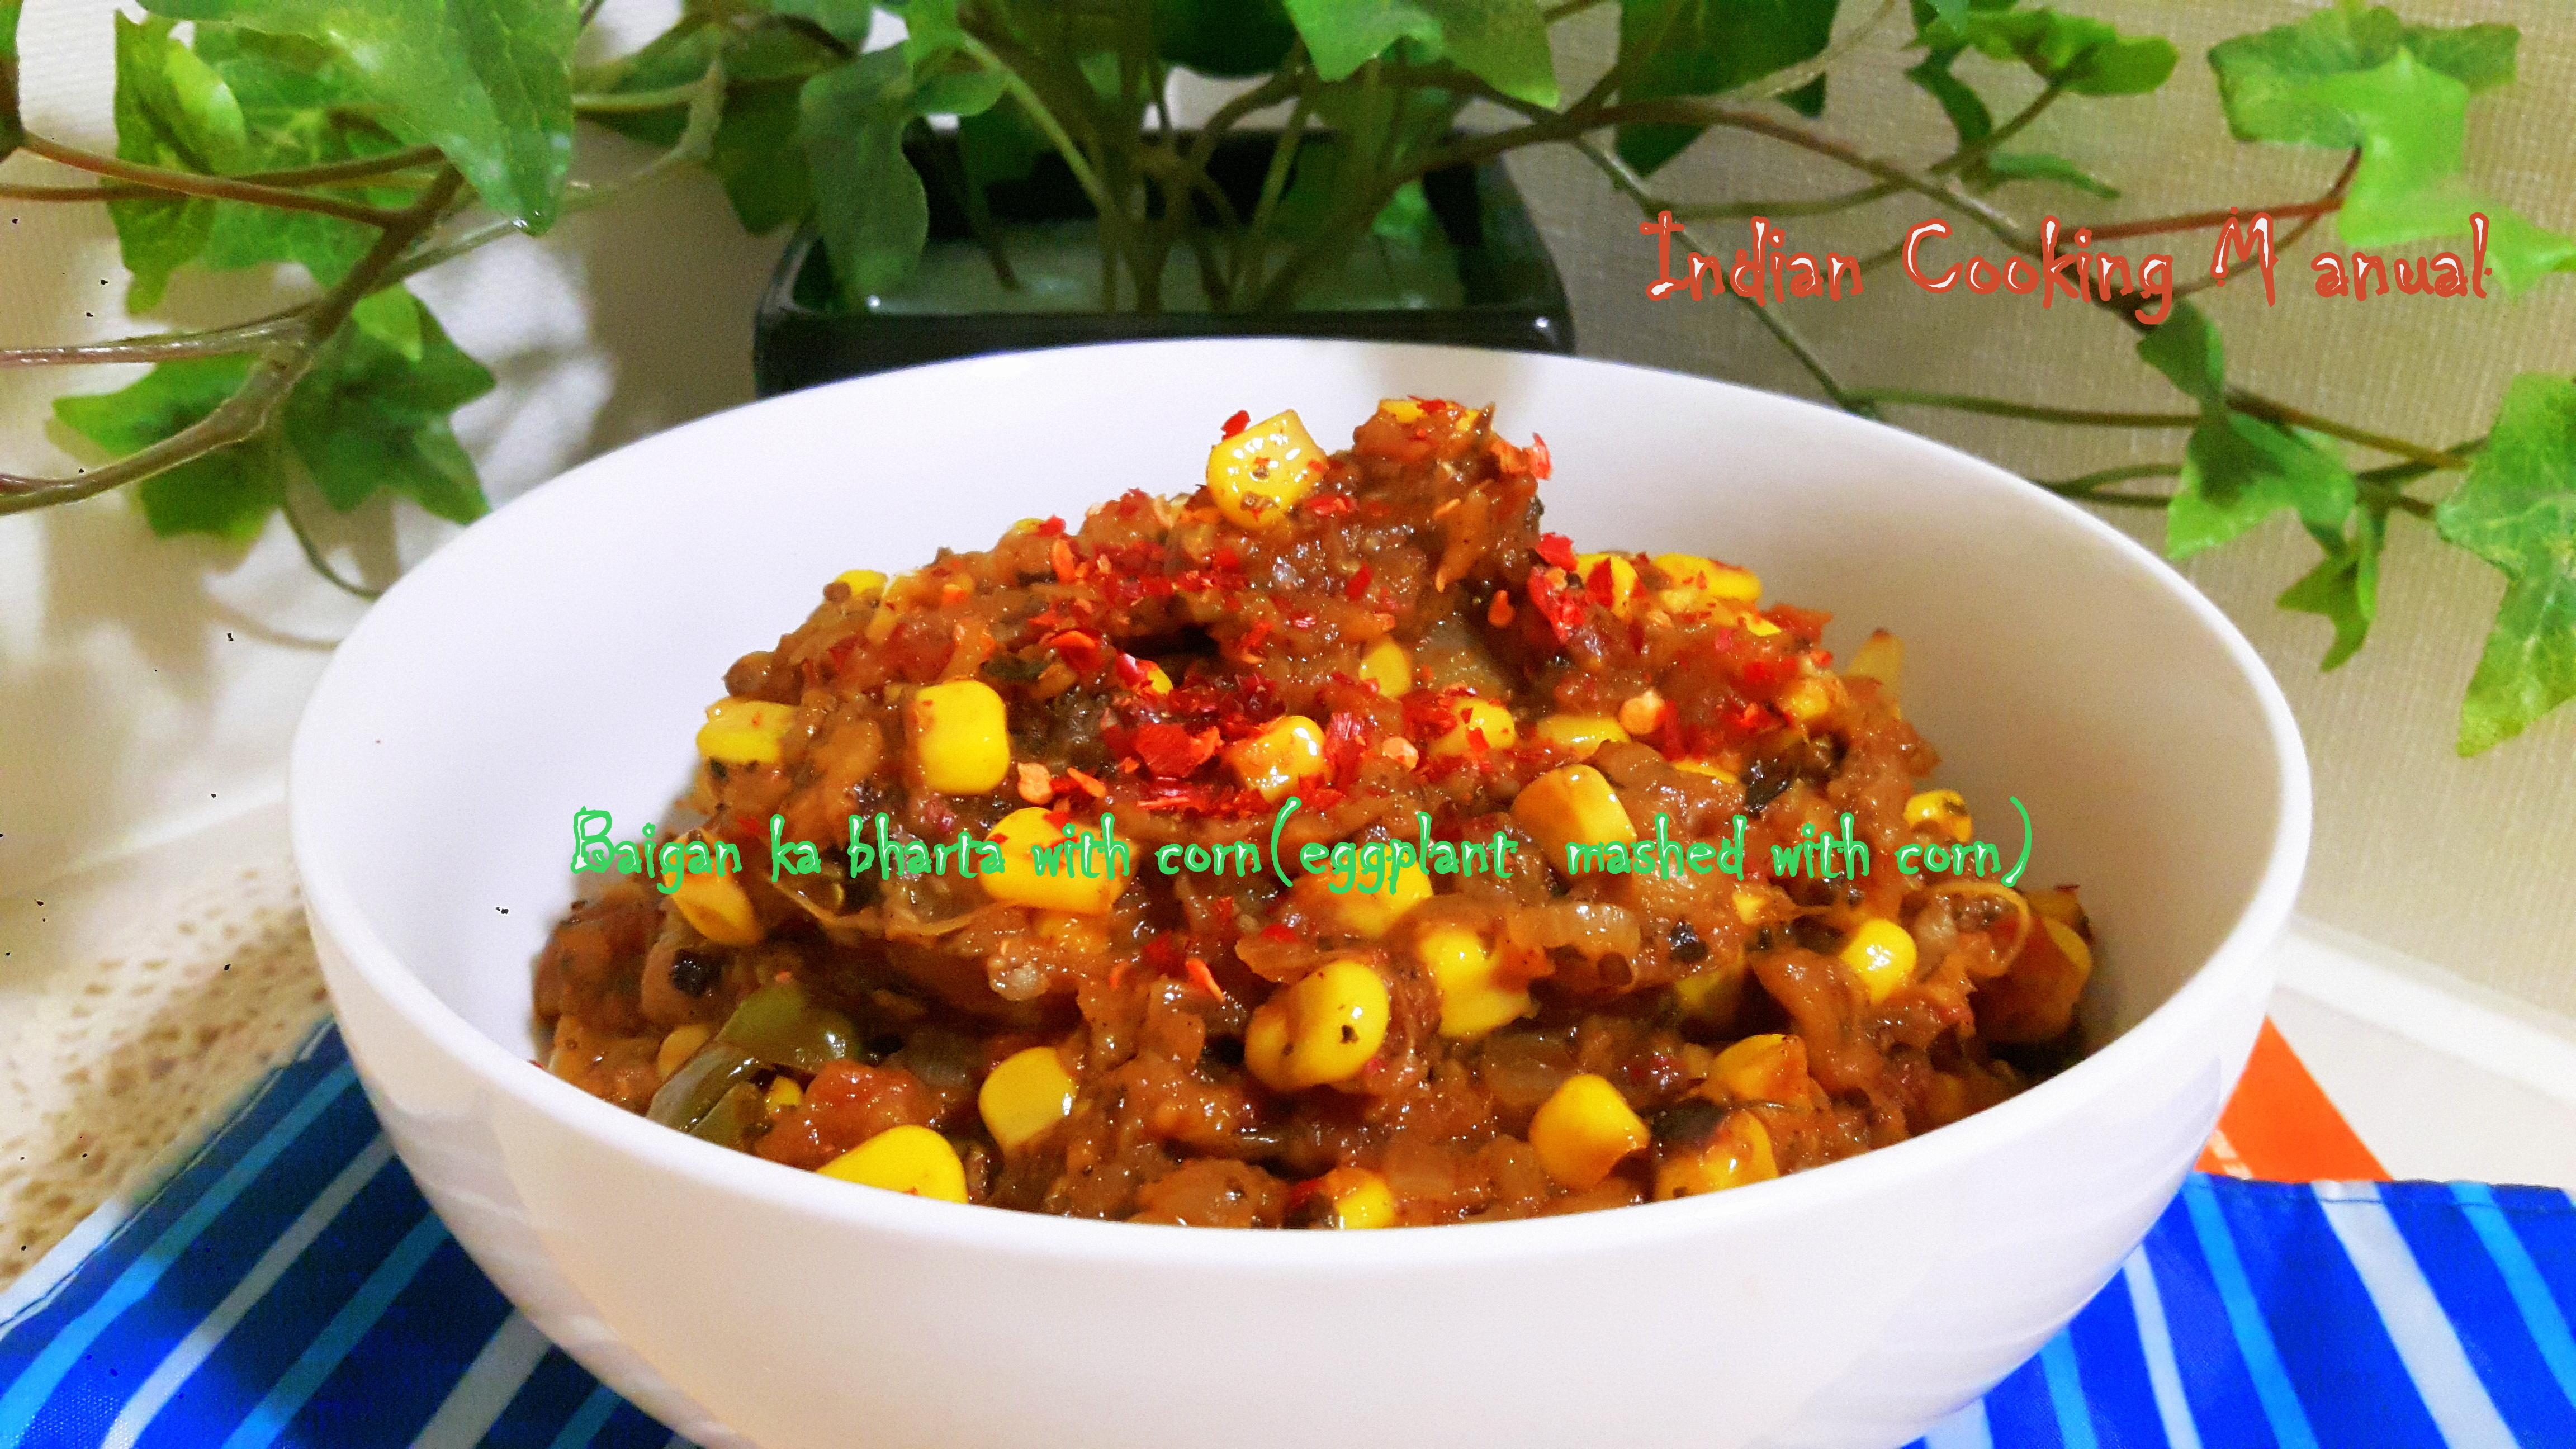 Baigan ka Bharta with Sweet Corn (Eggplant mashed with Corn)